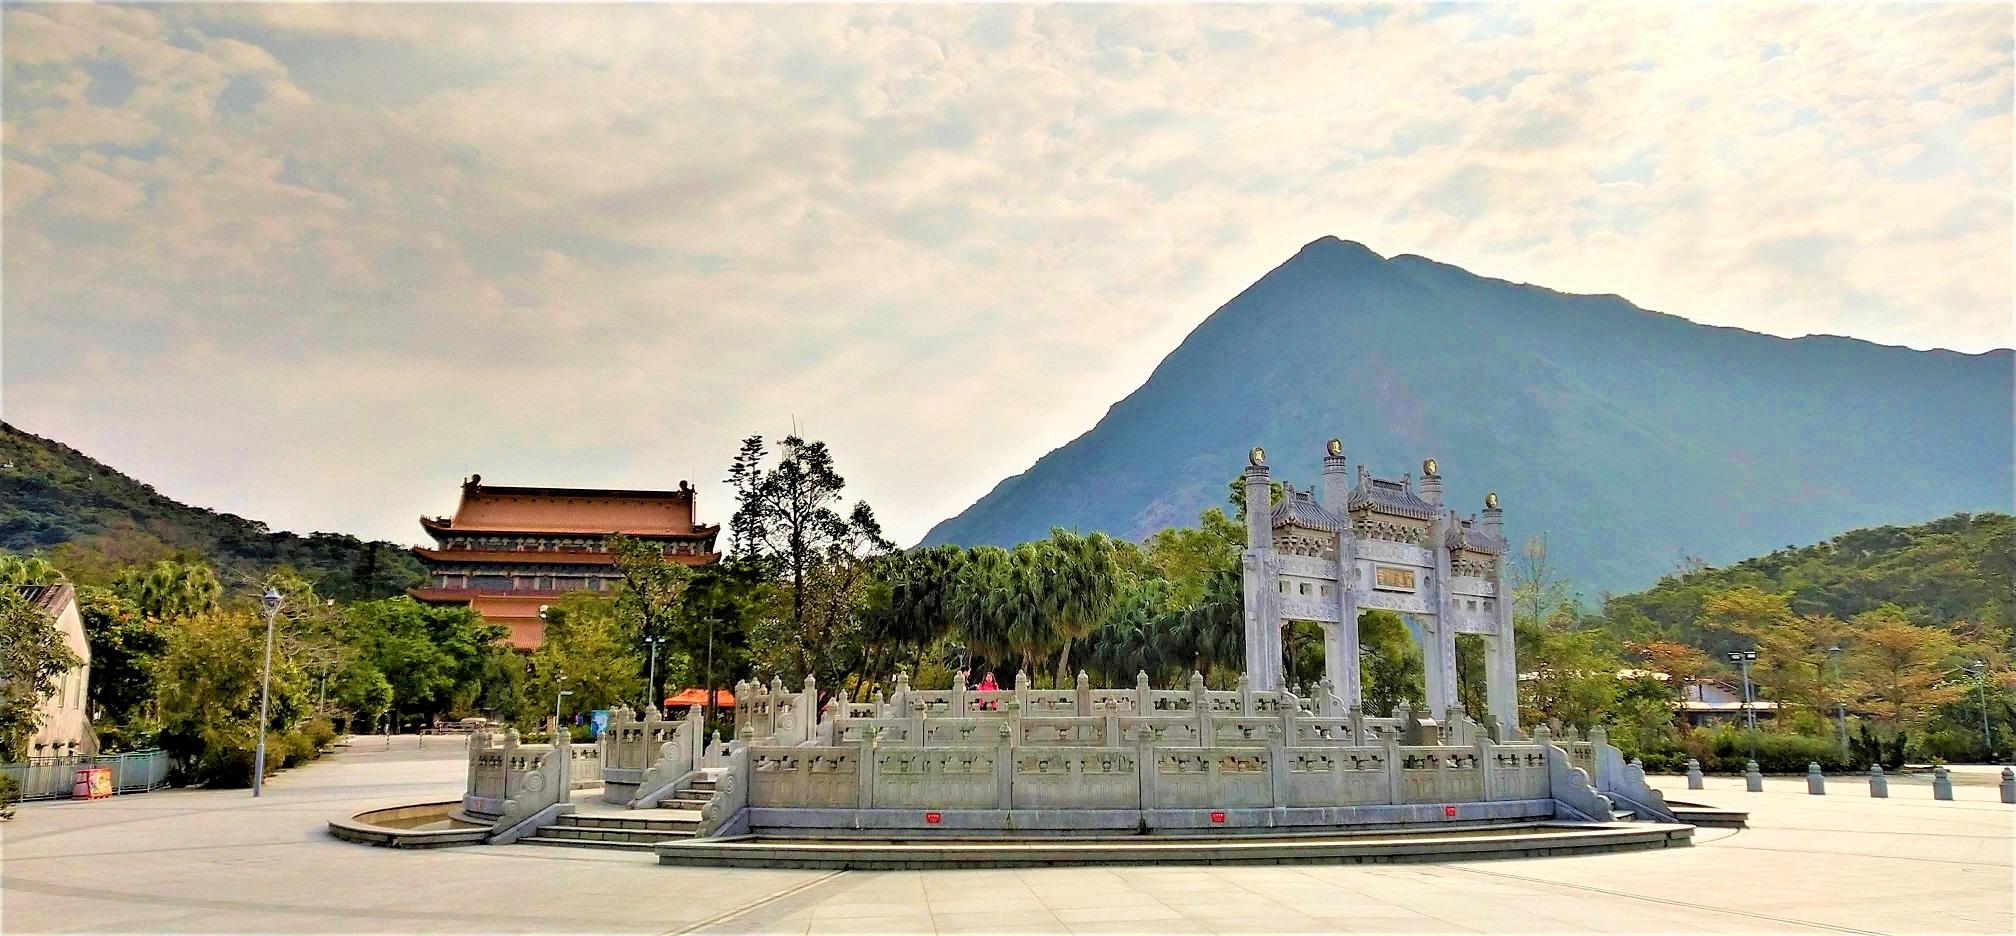 Po Lin Monastery and Lantau Peak